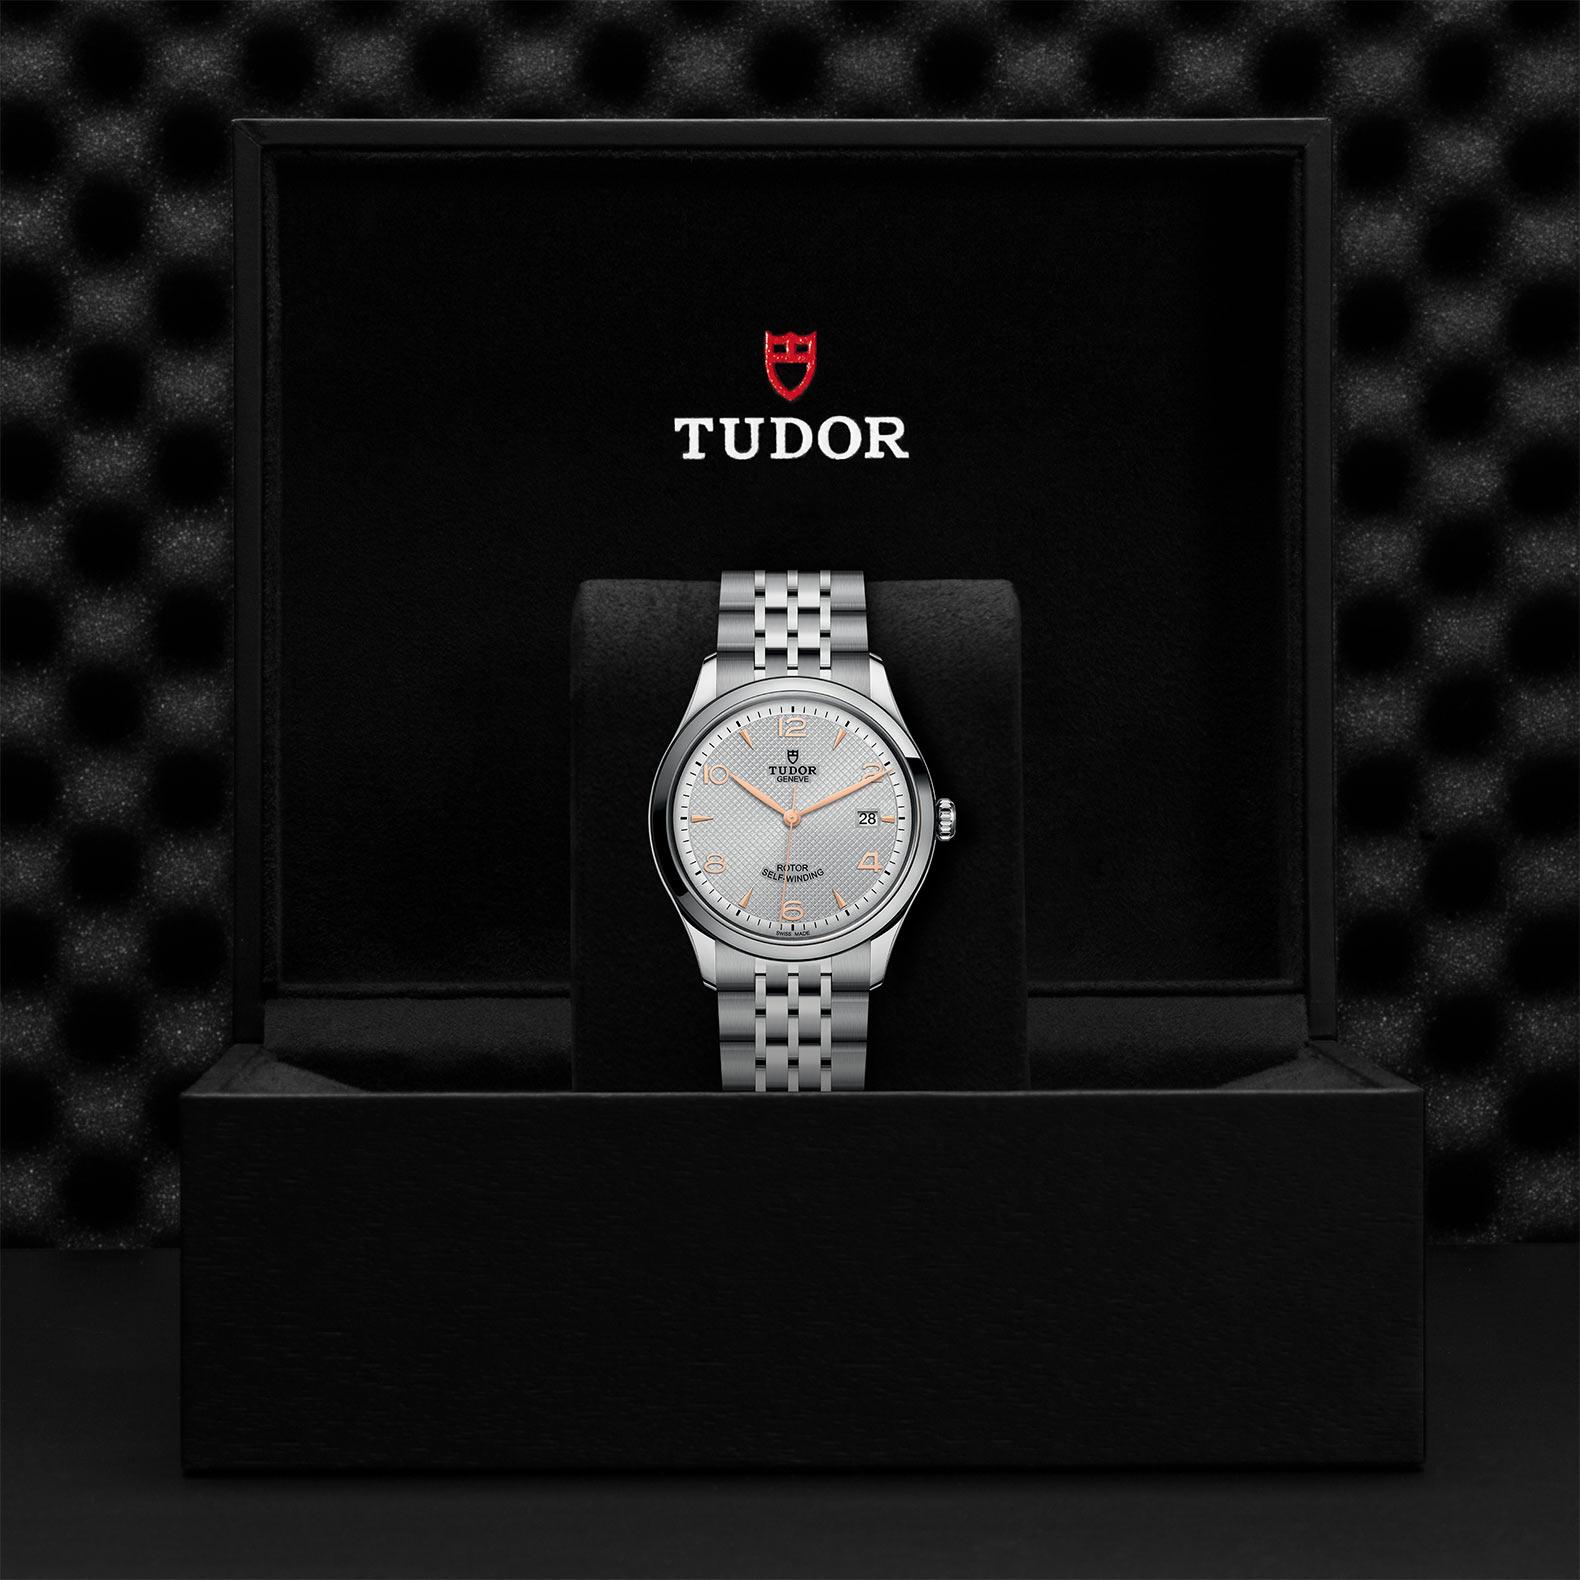 Tudor 1926 M91550-0001